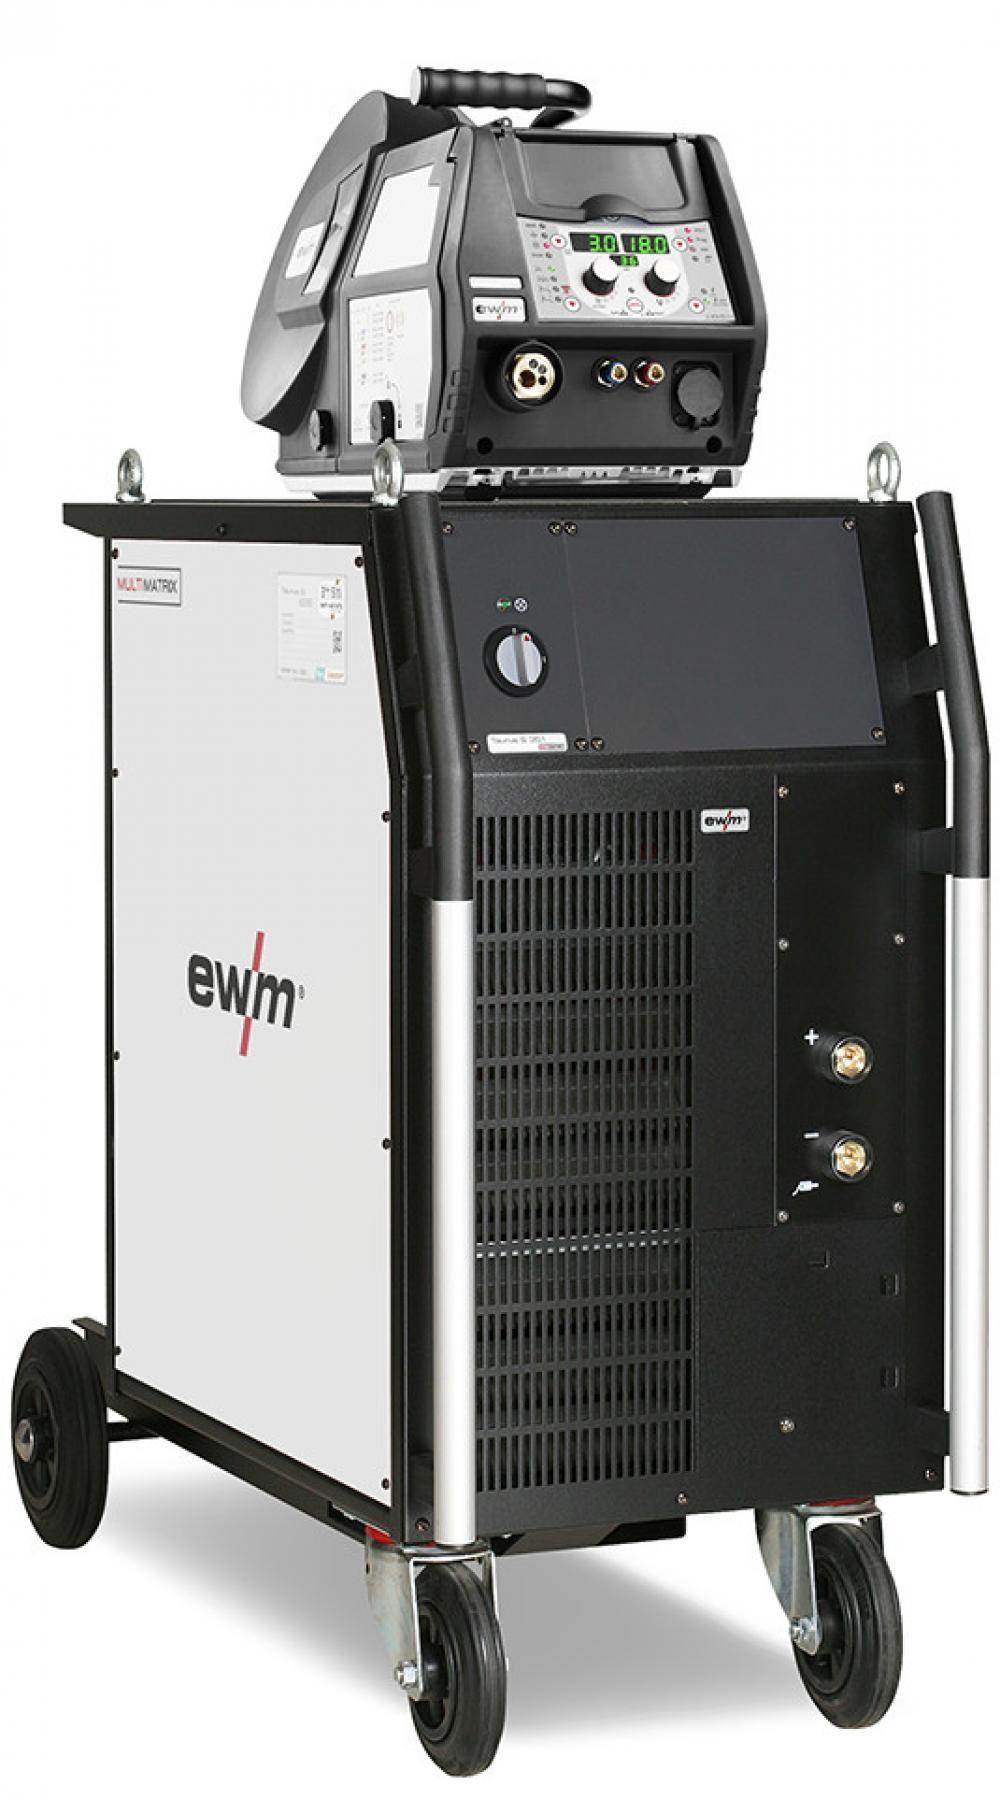 EWM TAURUS 351 DG SYNERGIC S MM с плавной регулировкой